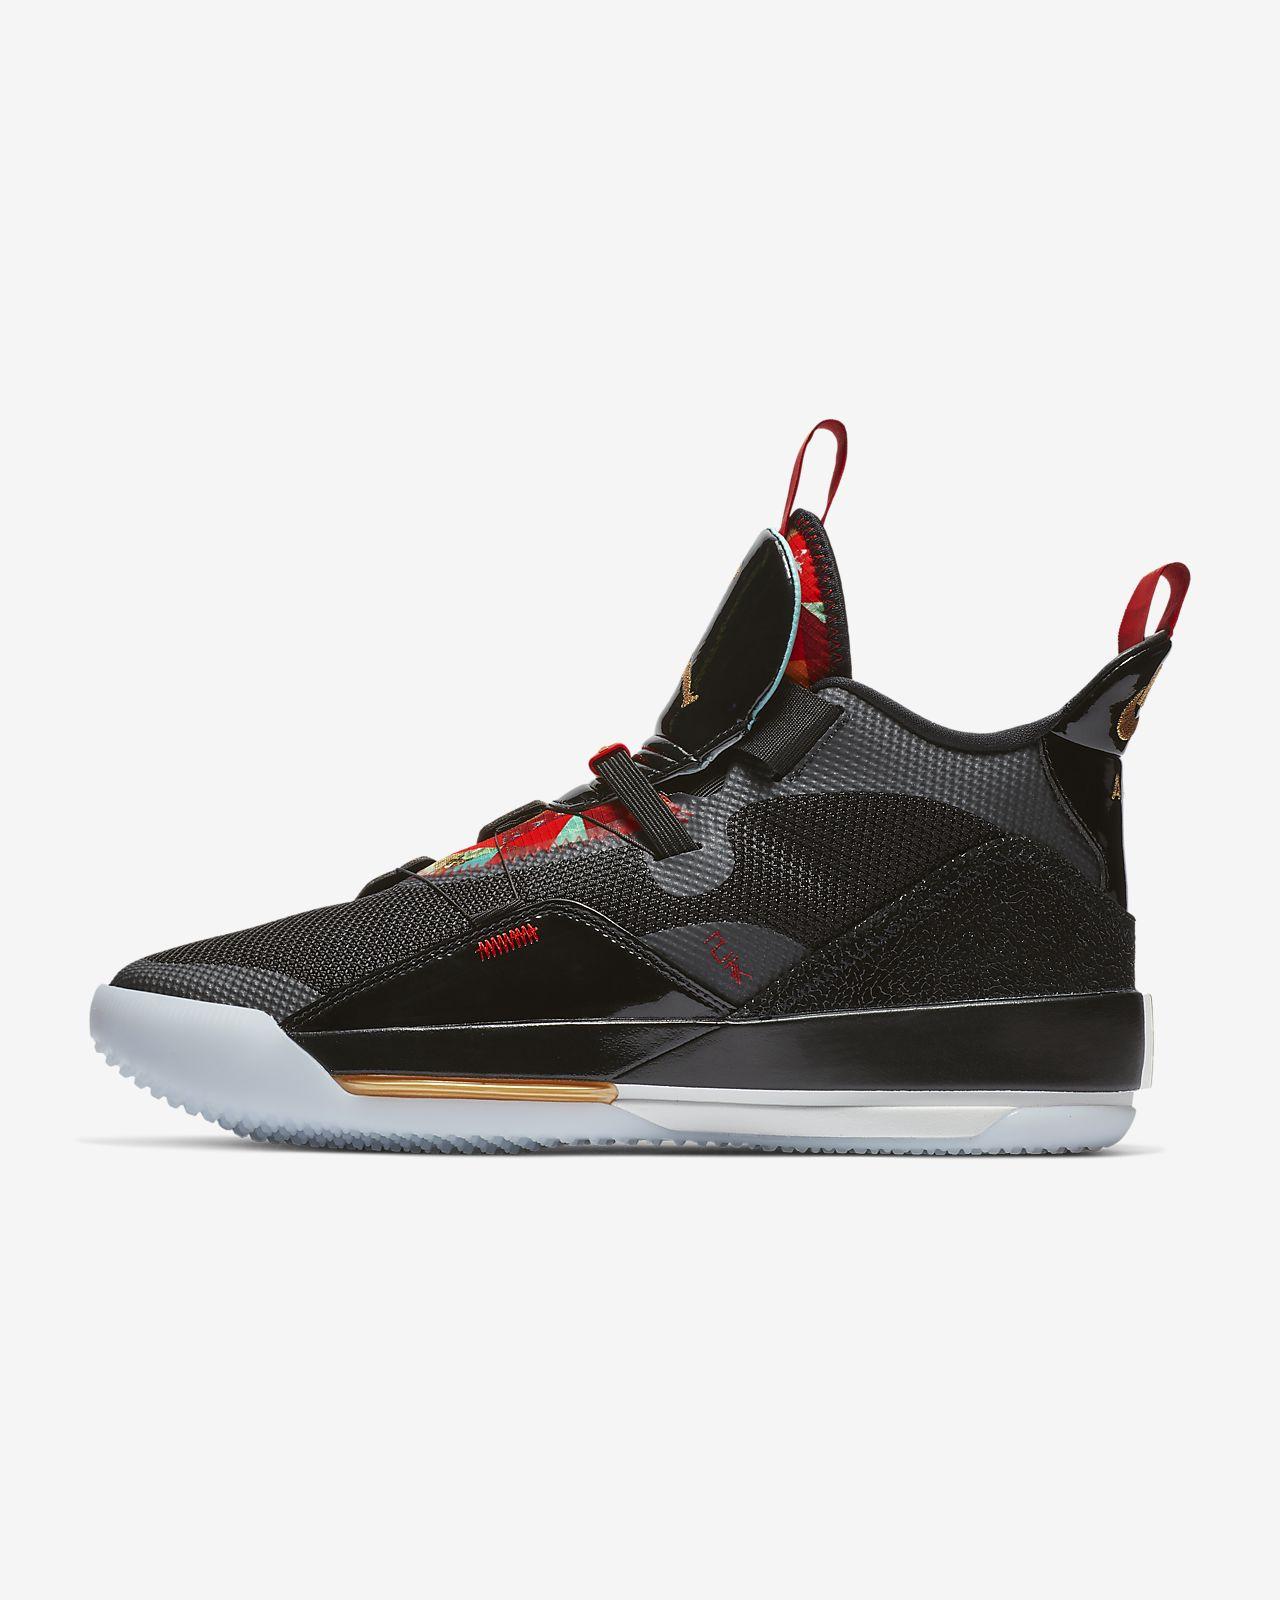 36cc0f9e88b1b4 Low Resolution Баскетбольные кроссовки Air Jordan XXXIII Баскетбольные  кроссовки Air Jordan XXXIII